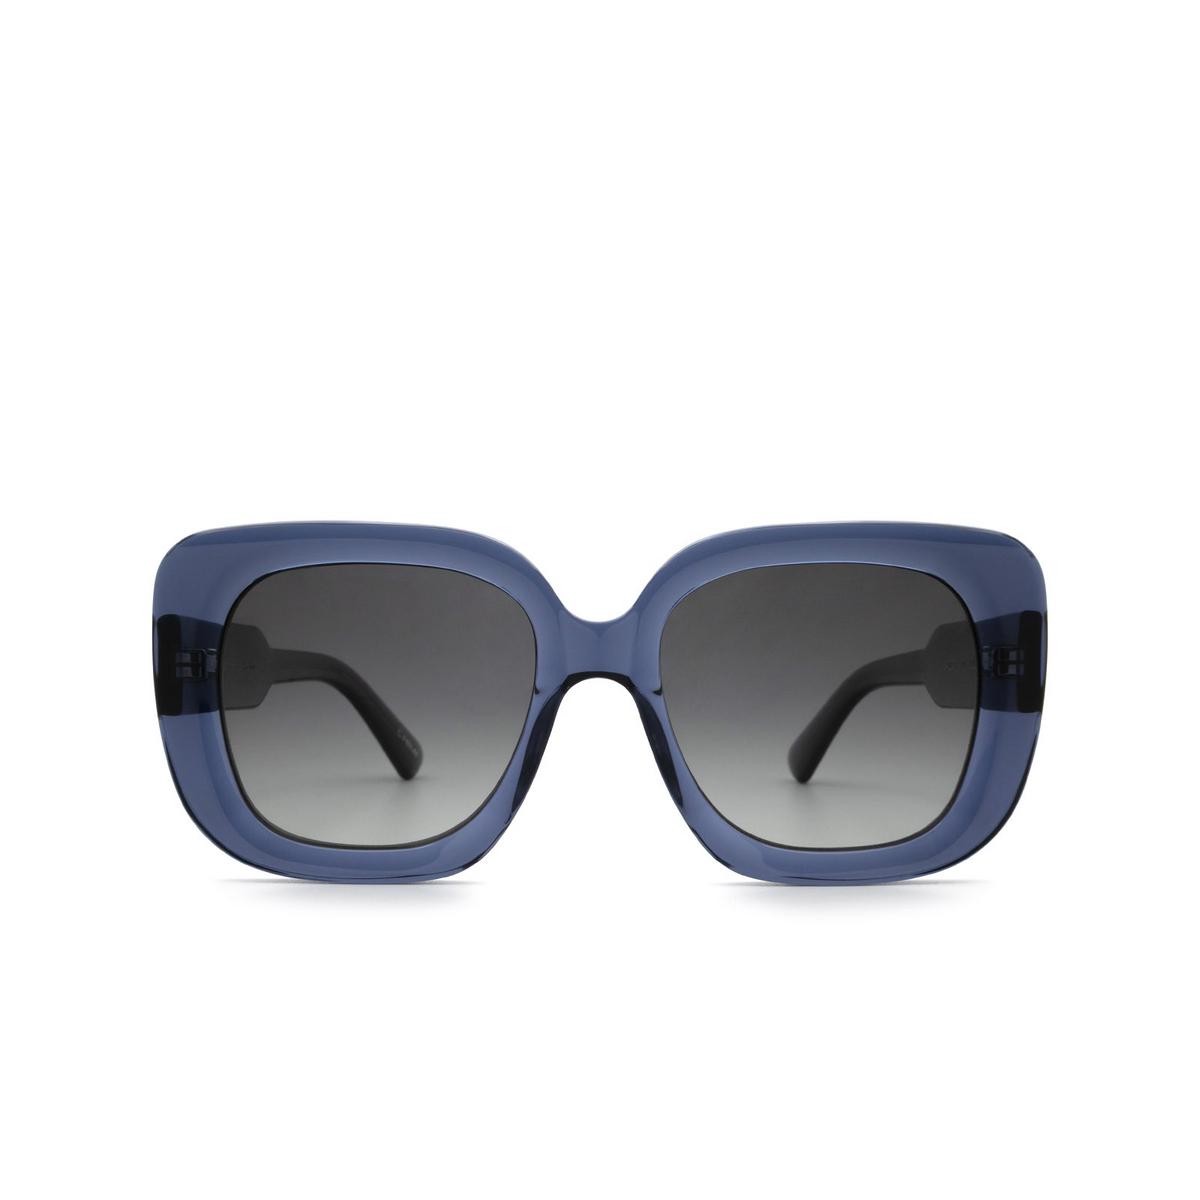 Chimi® Square Sunglasses: 10 color Blue - front view.